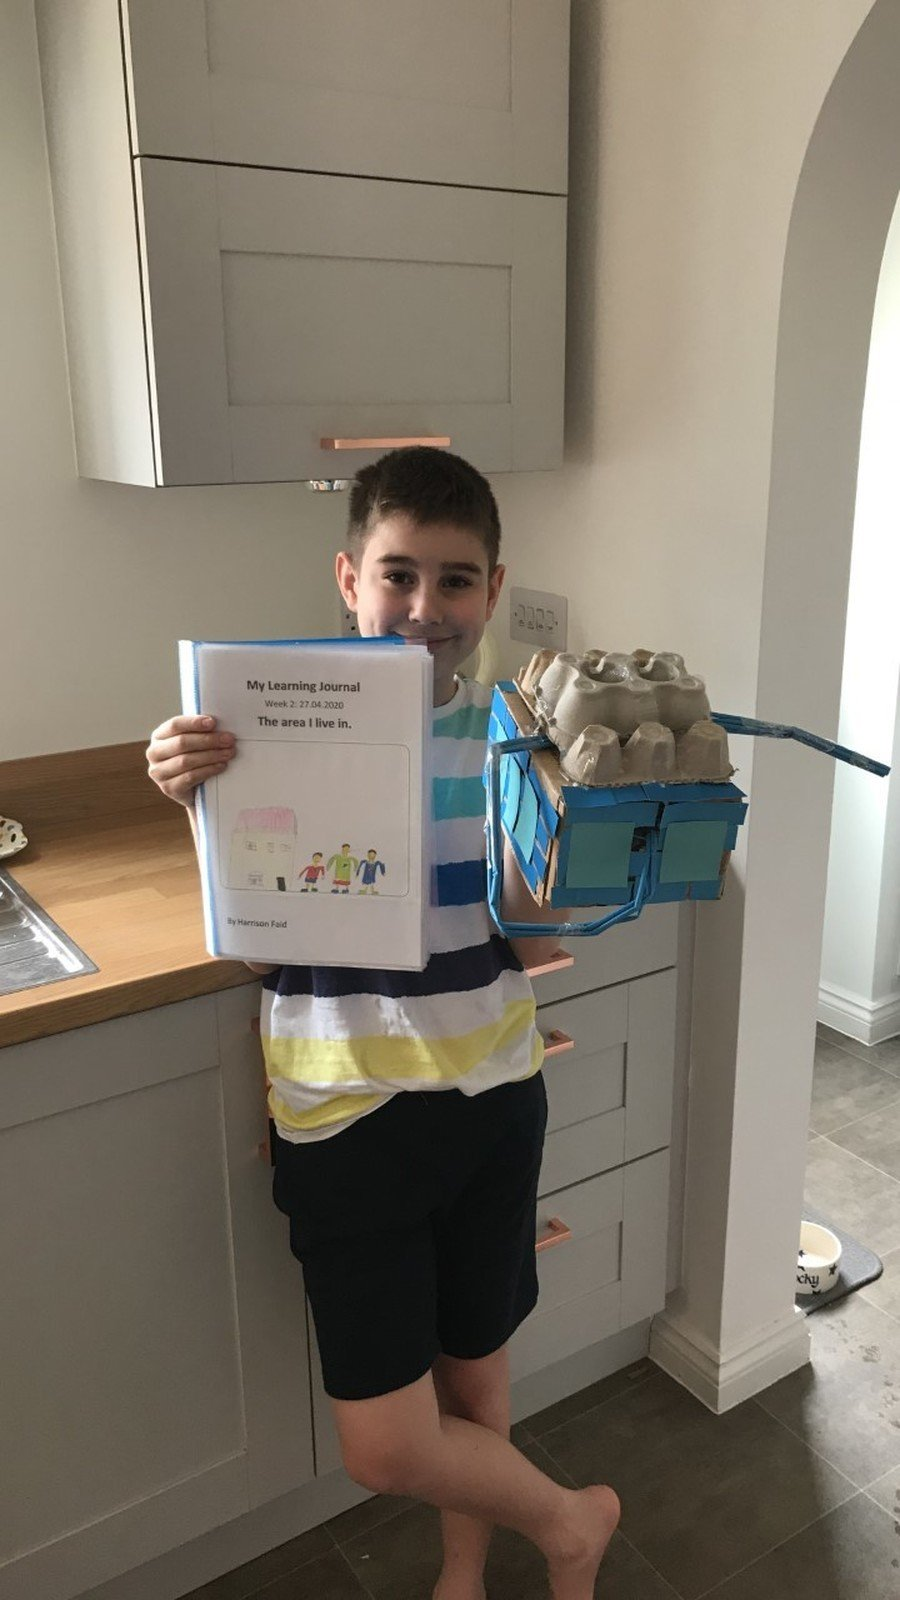 Harrison enjoying the learning journals.